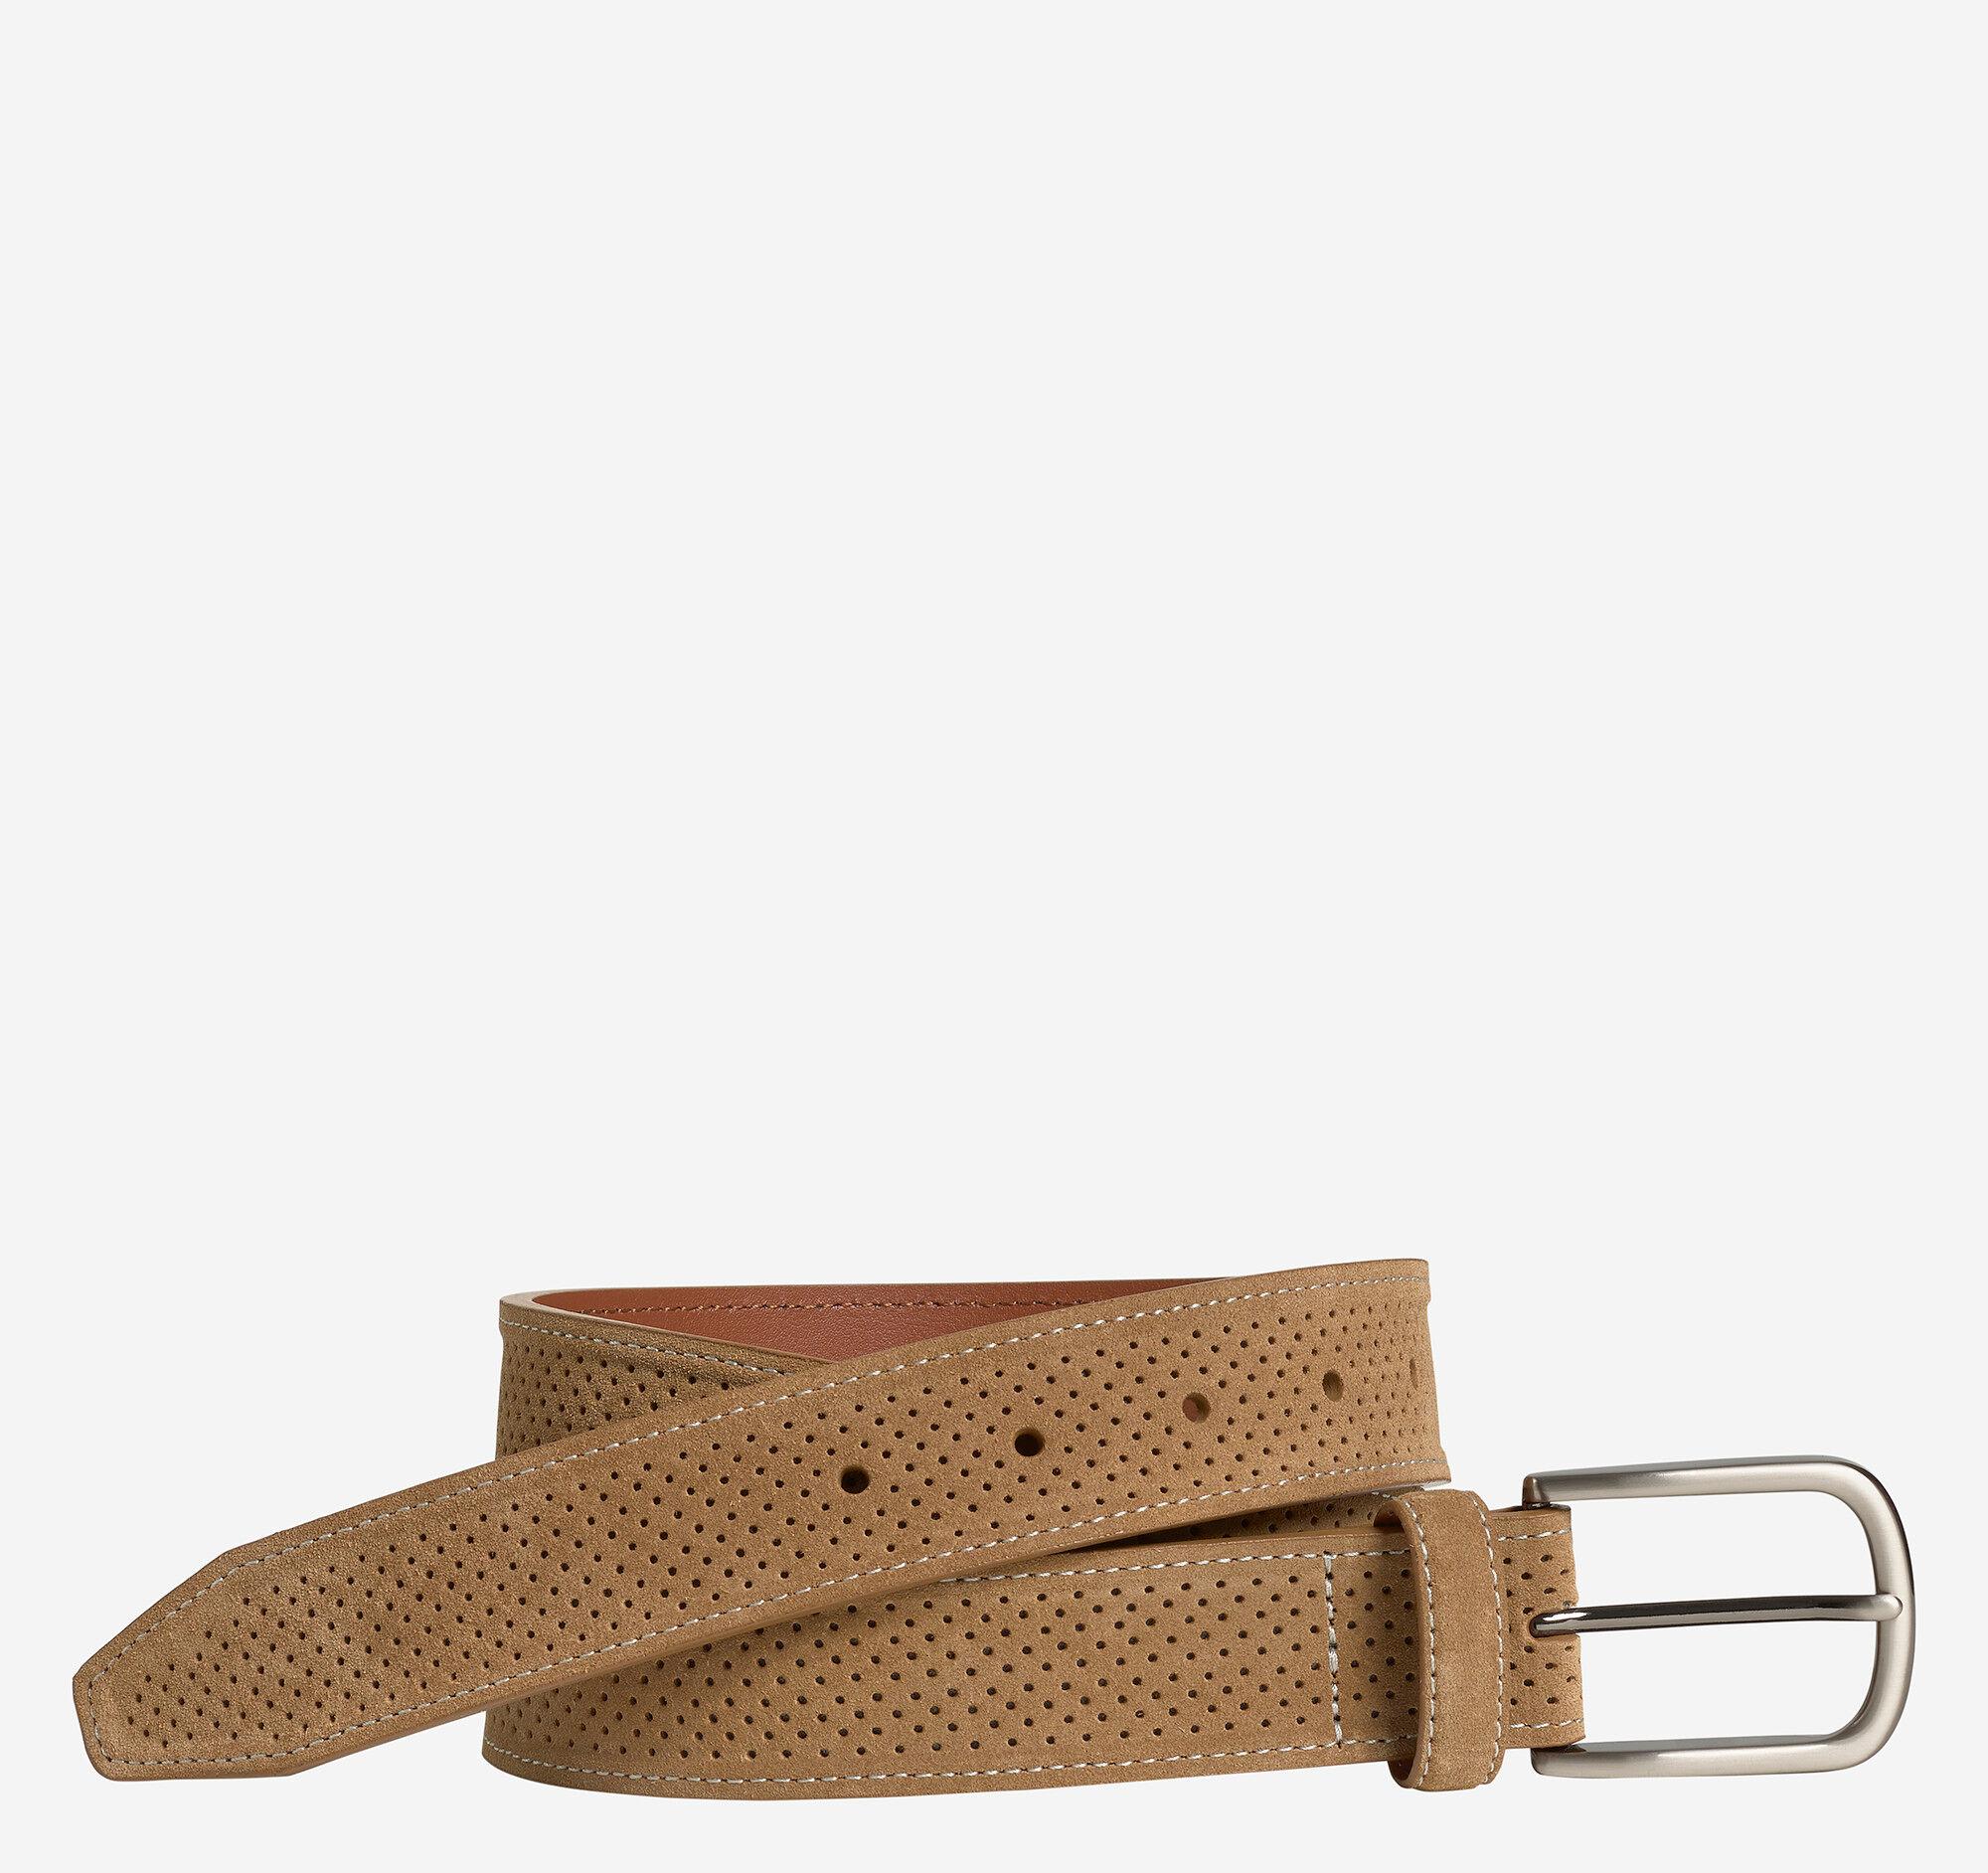 Johnston & Murphy Men's Suede Perf Belt - Tan Suede Leather - Size 32